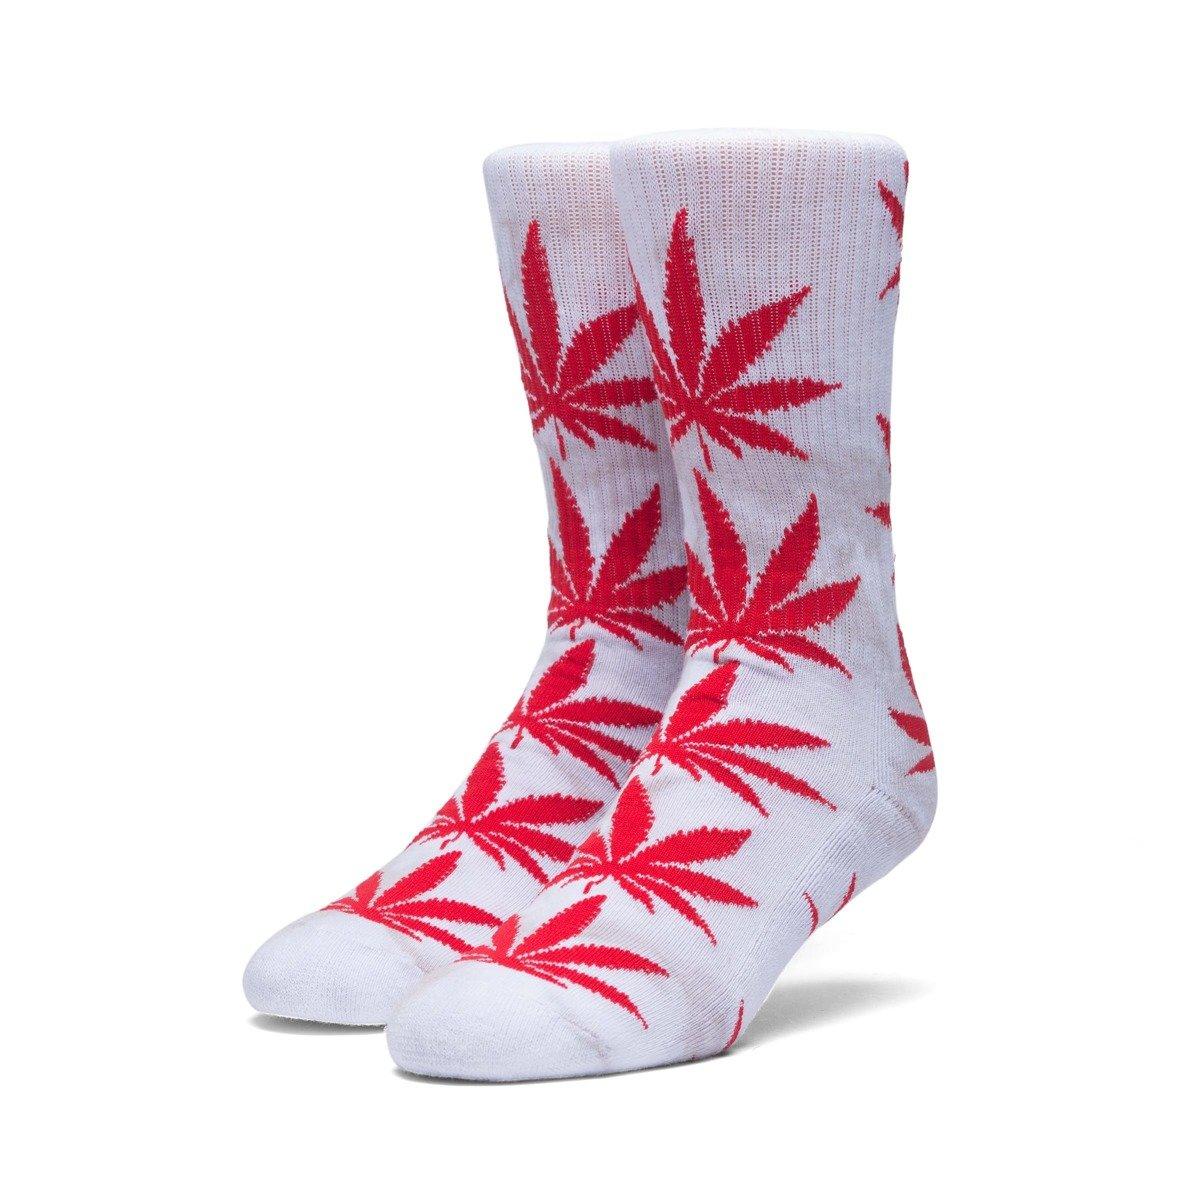 a2789a4f57006 miniramp.pl/eng_pl_huf-plantlife-tie-dye-crew-sock...